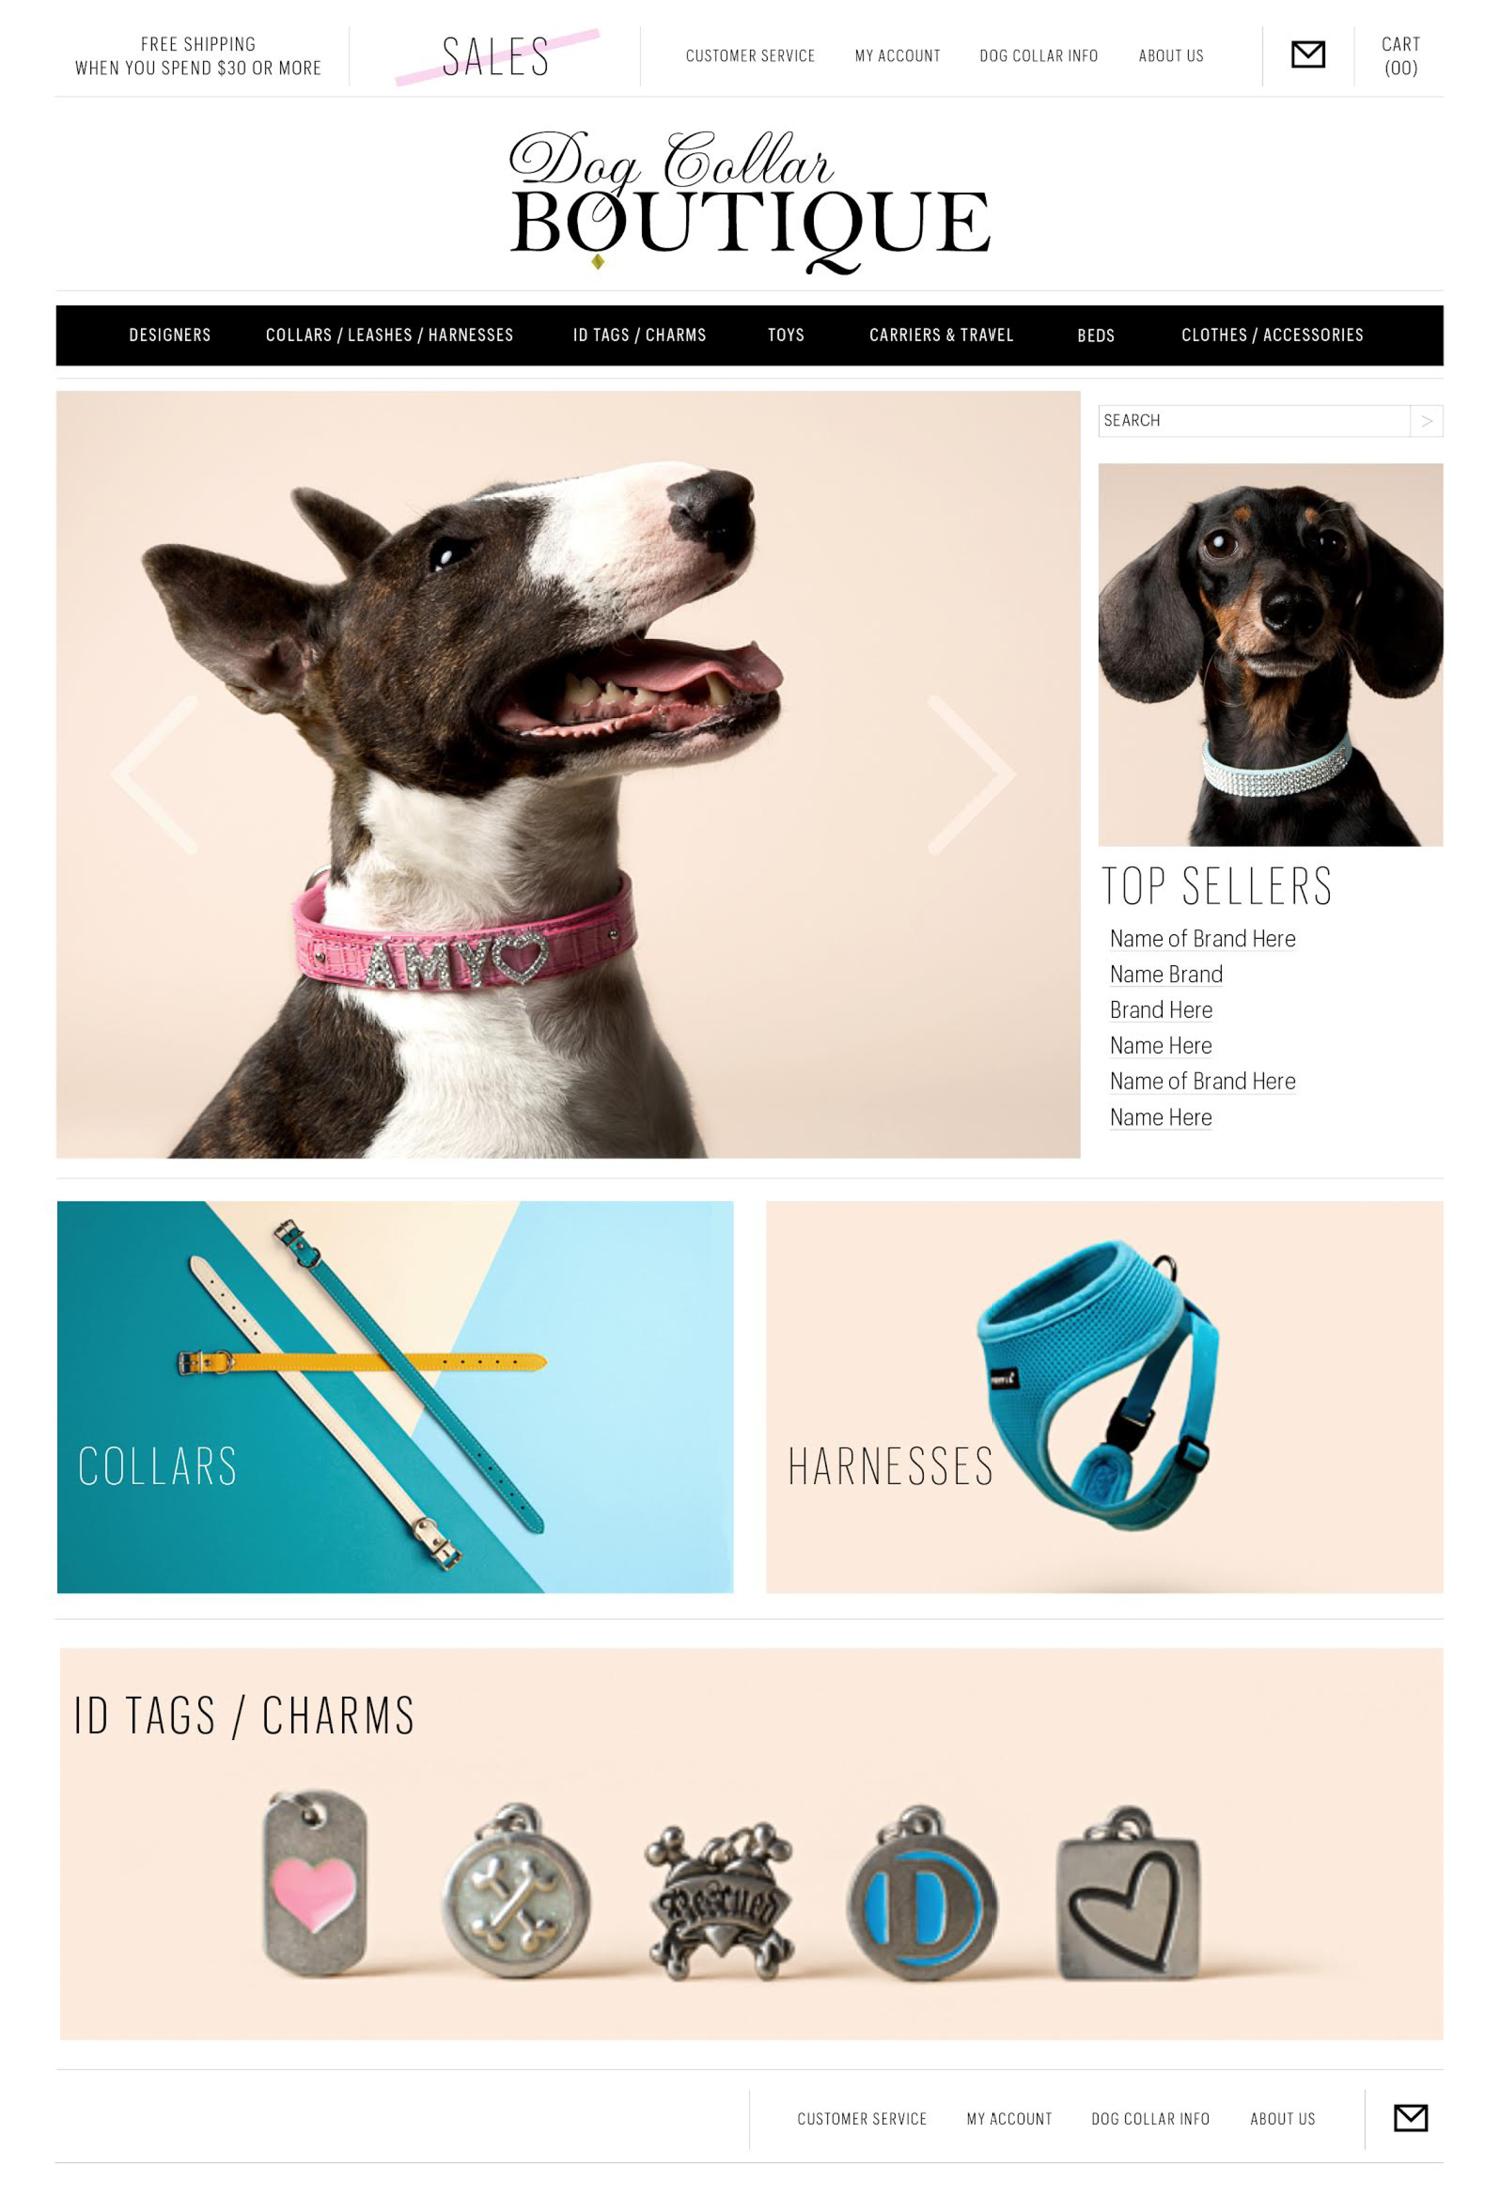 MrsSizzle_Work_Dog Collar Boutique.jpg